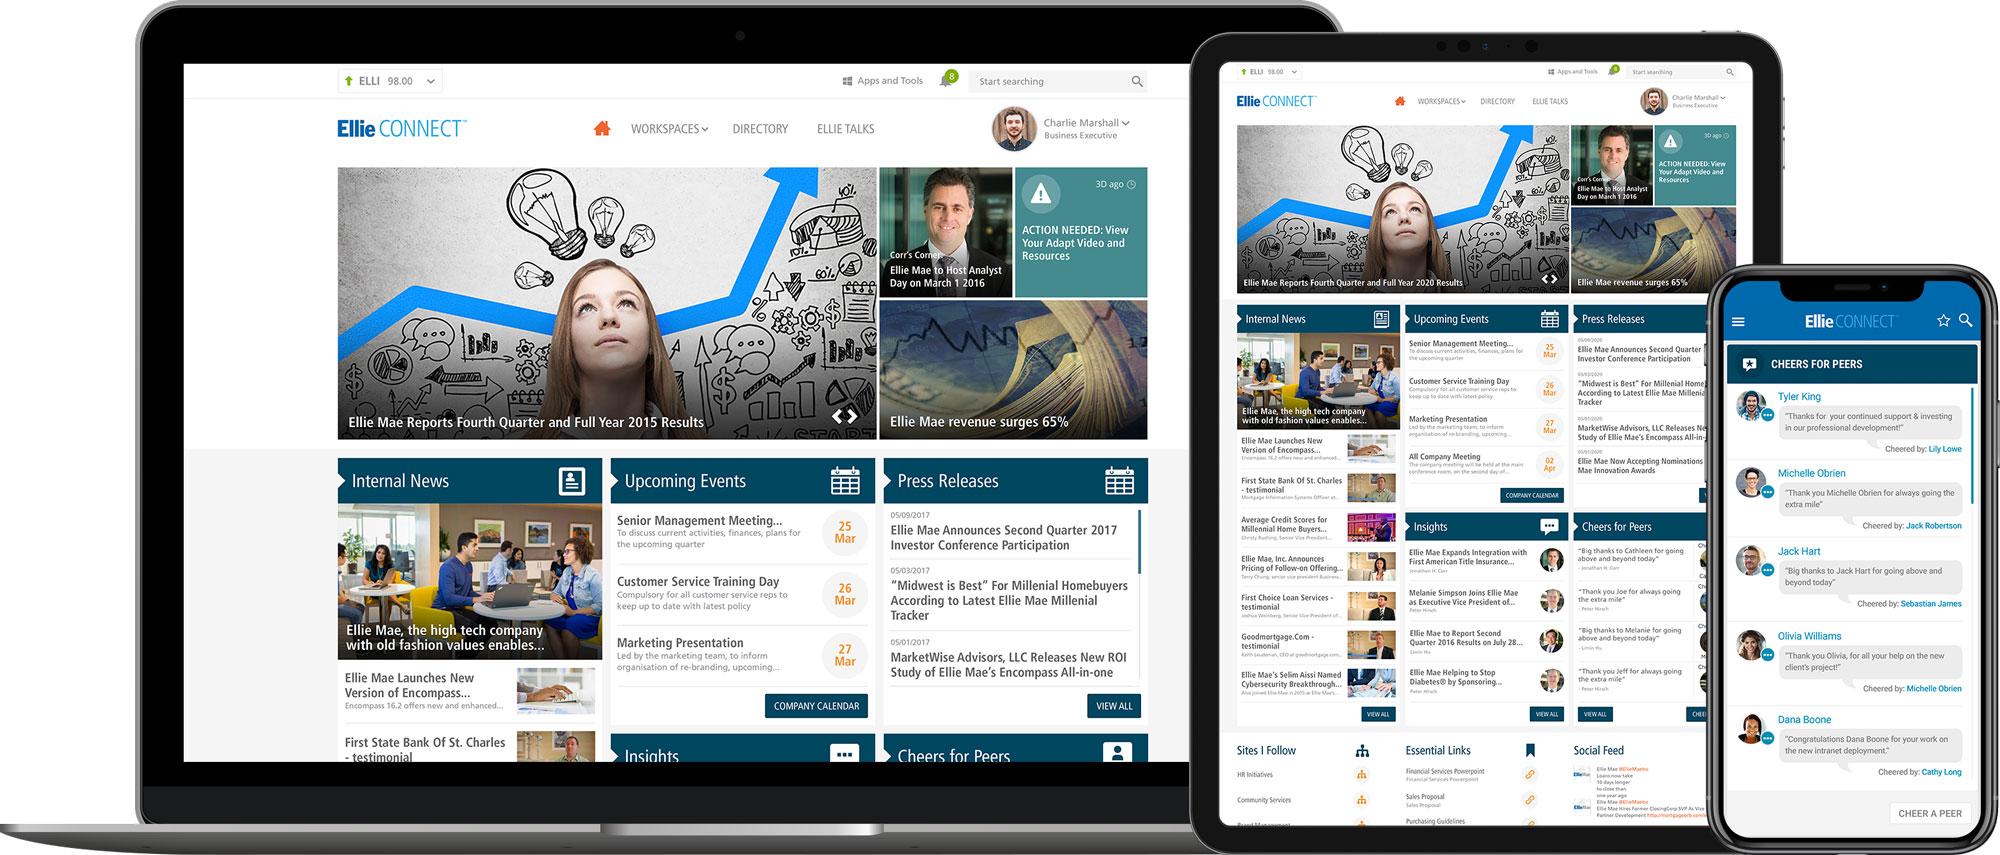 Ellie mae homepage on desktop, tablet and mobile